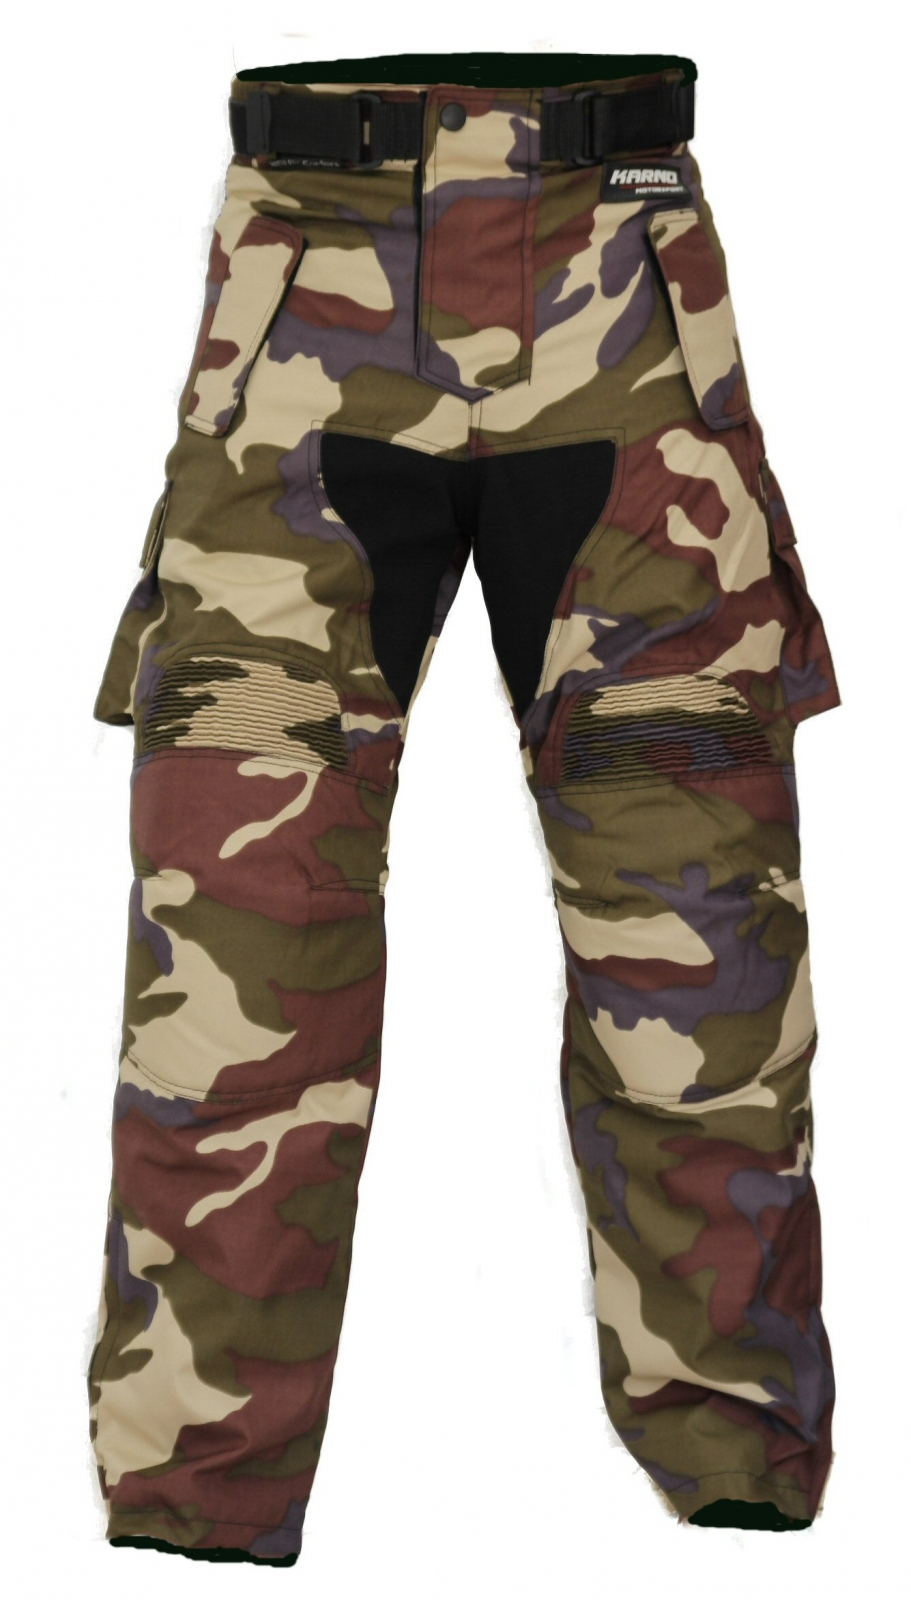 pantalon moto quad camouflage militaire vert marpat woodland. Black Bedroom Furniture Sets. Home Design Ideas